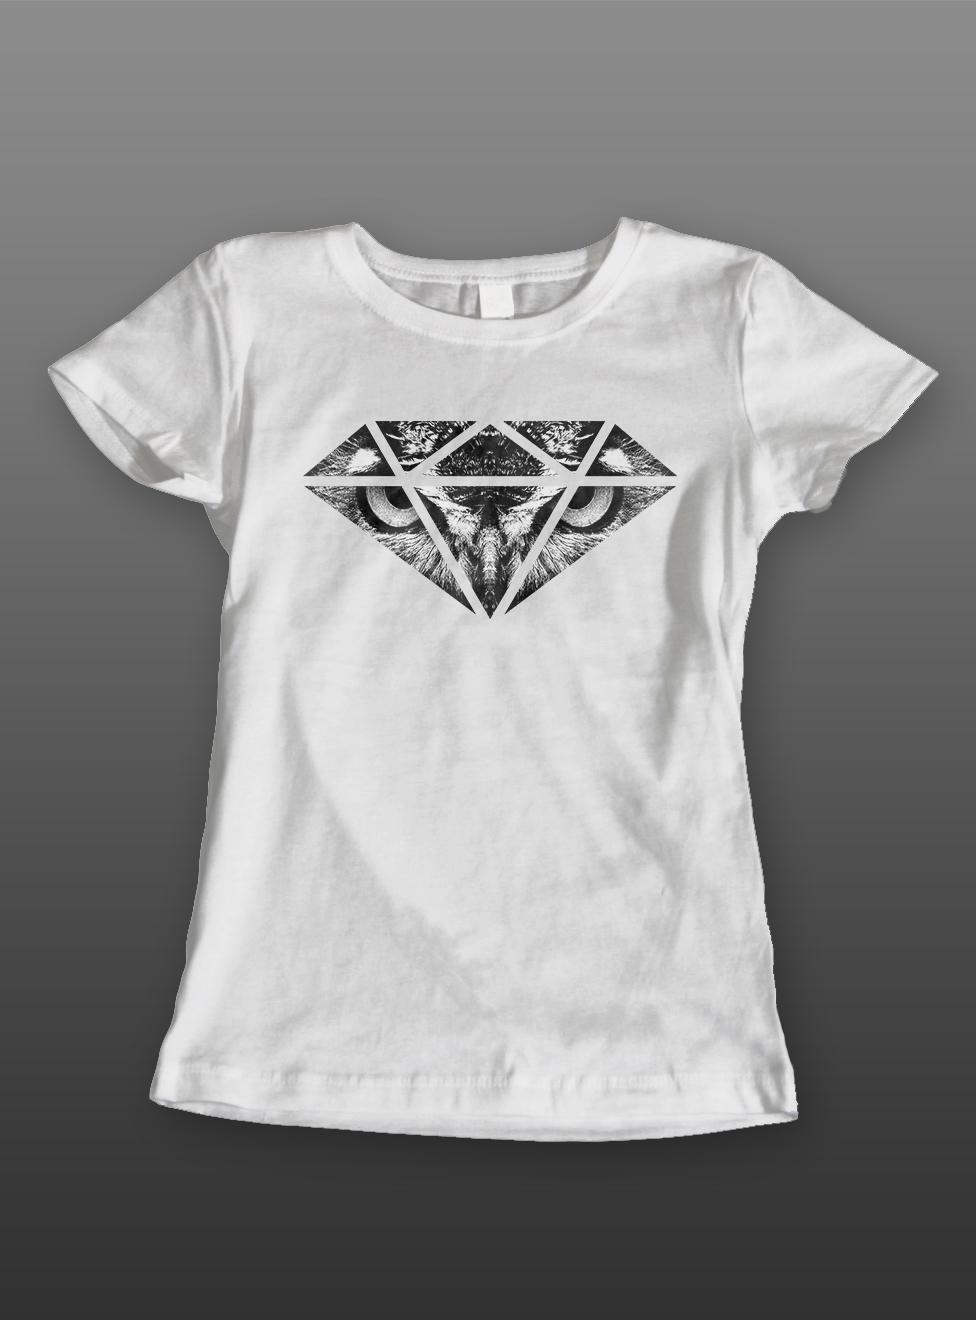 "BLACKND ""OWL DIAMOND"" T-SHIRT DESIGN on Behance"